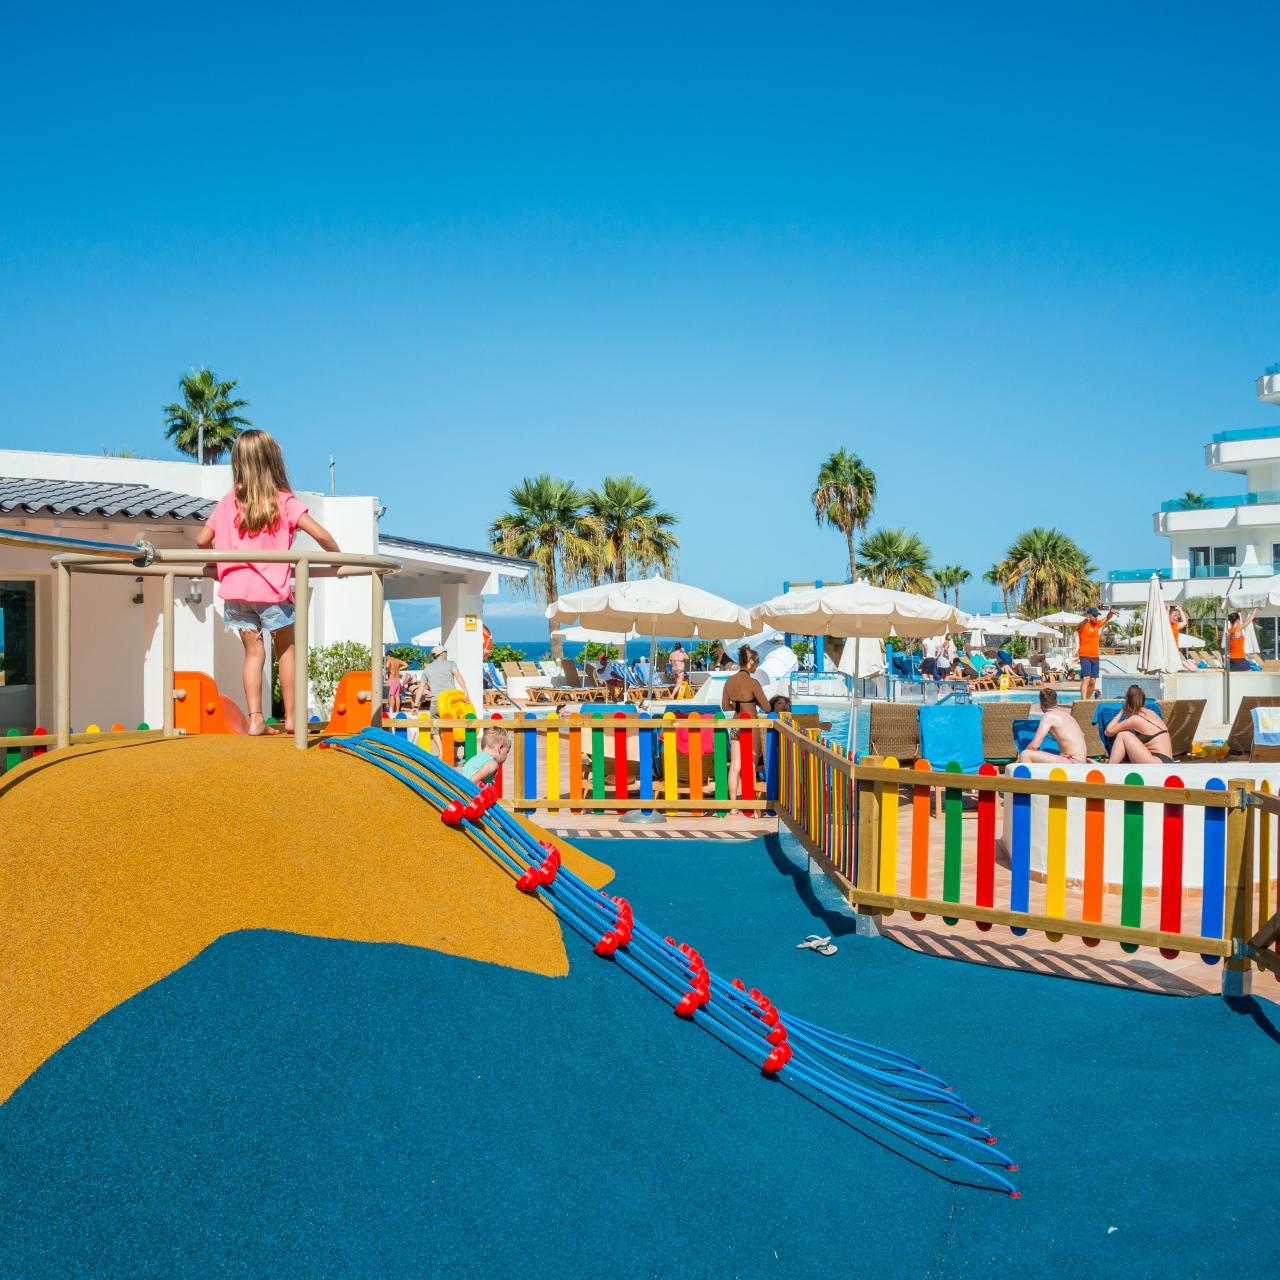 Hovima La Pinta Beachfront Family Hotel 4 Hrs Star Hotel In Tenerife Kanaren